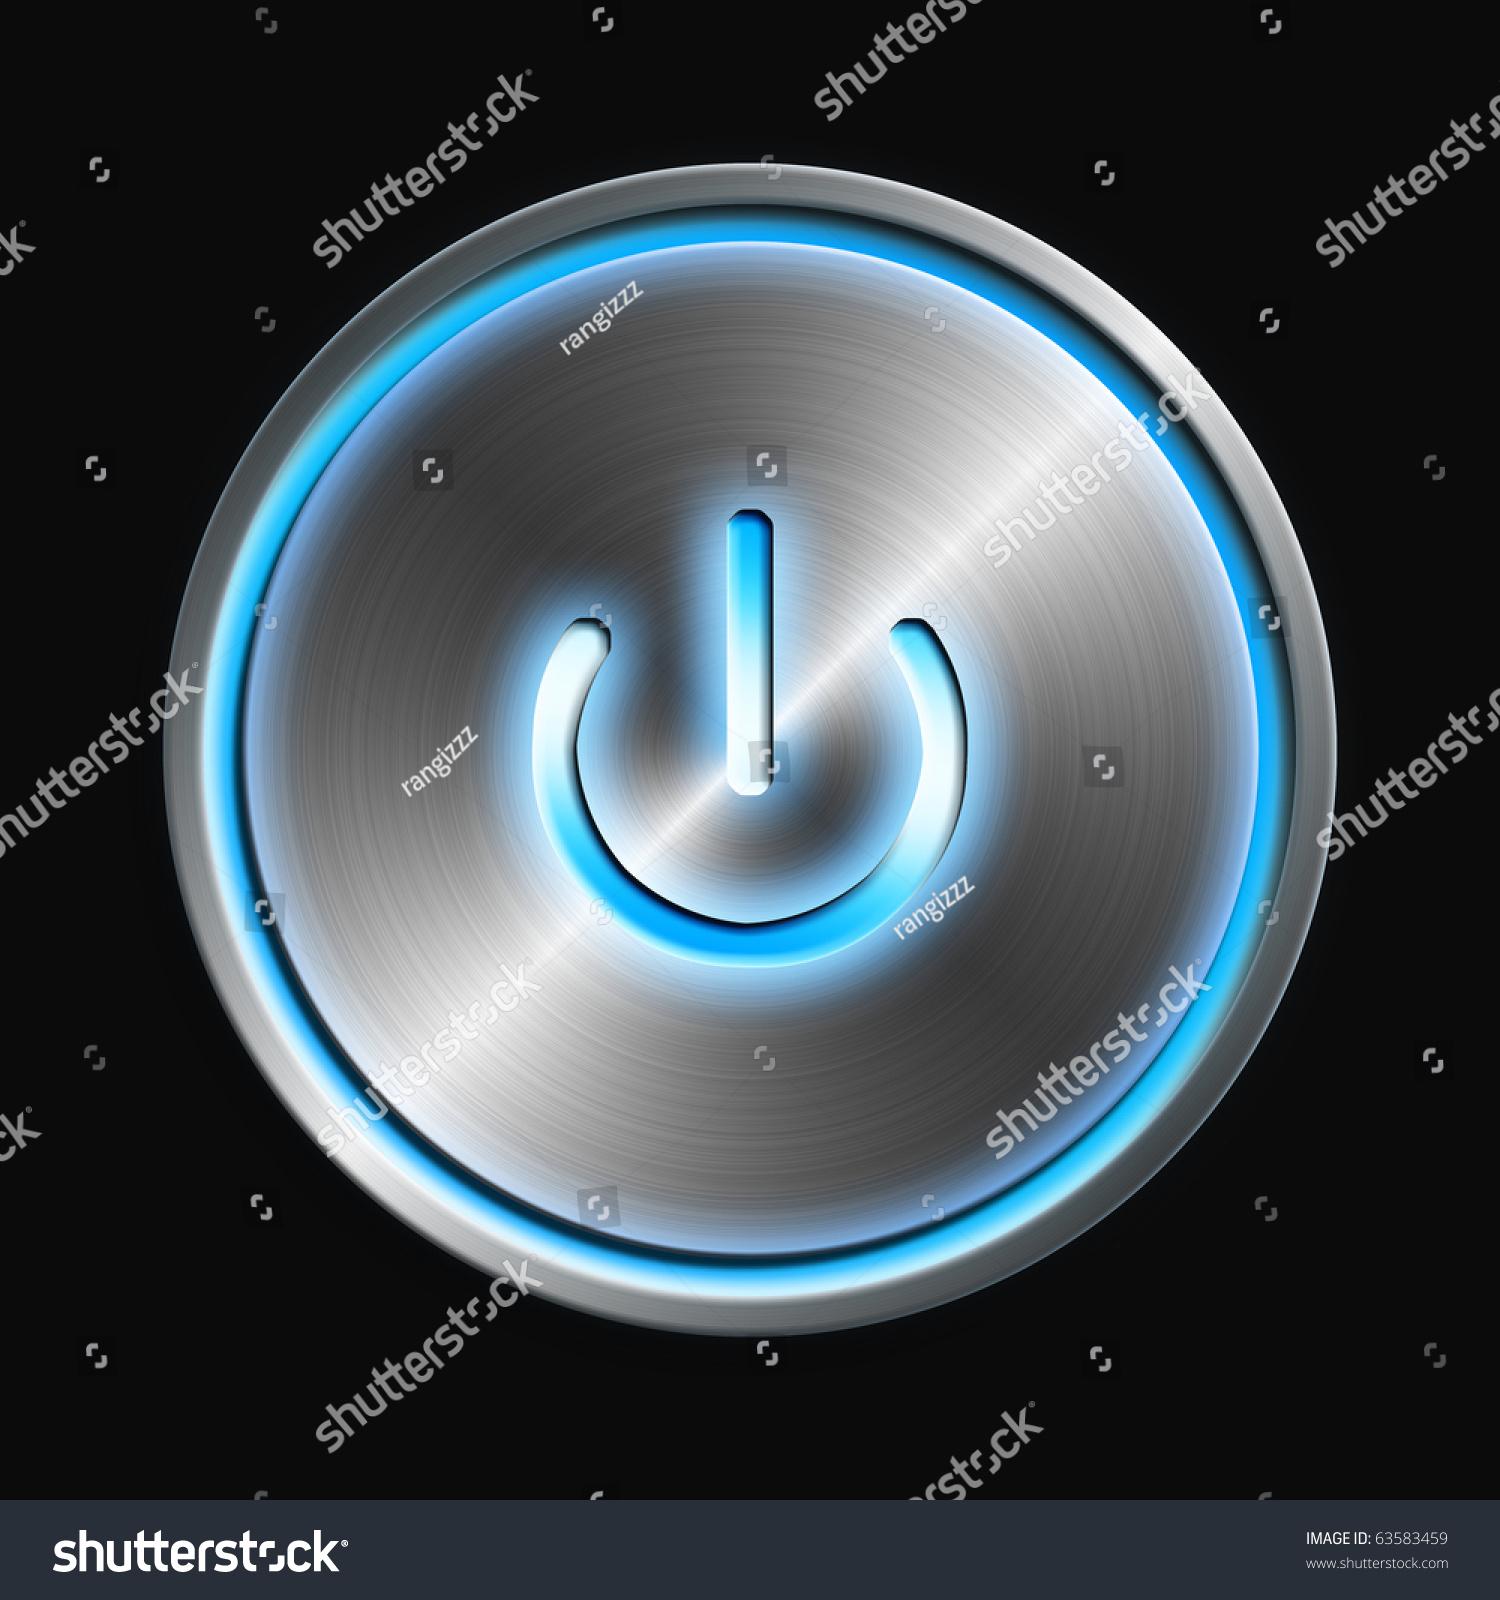 Glowing Power Button Stock Illustration 63583459 - Shutterstock